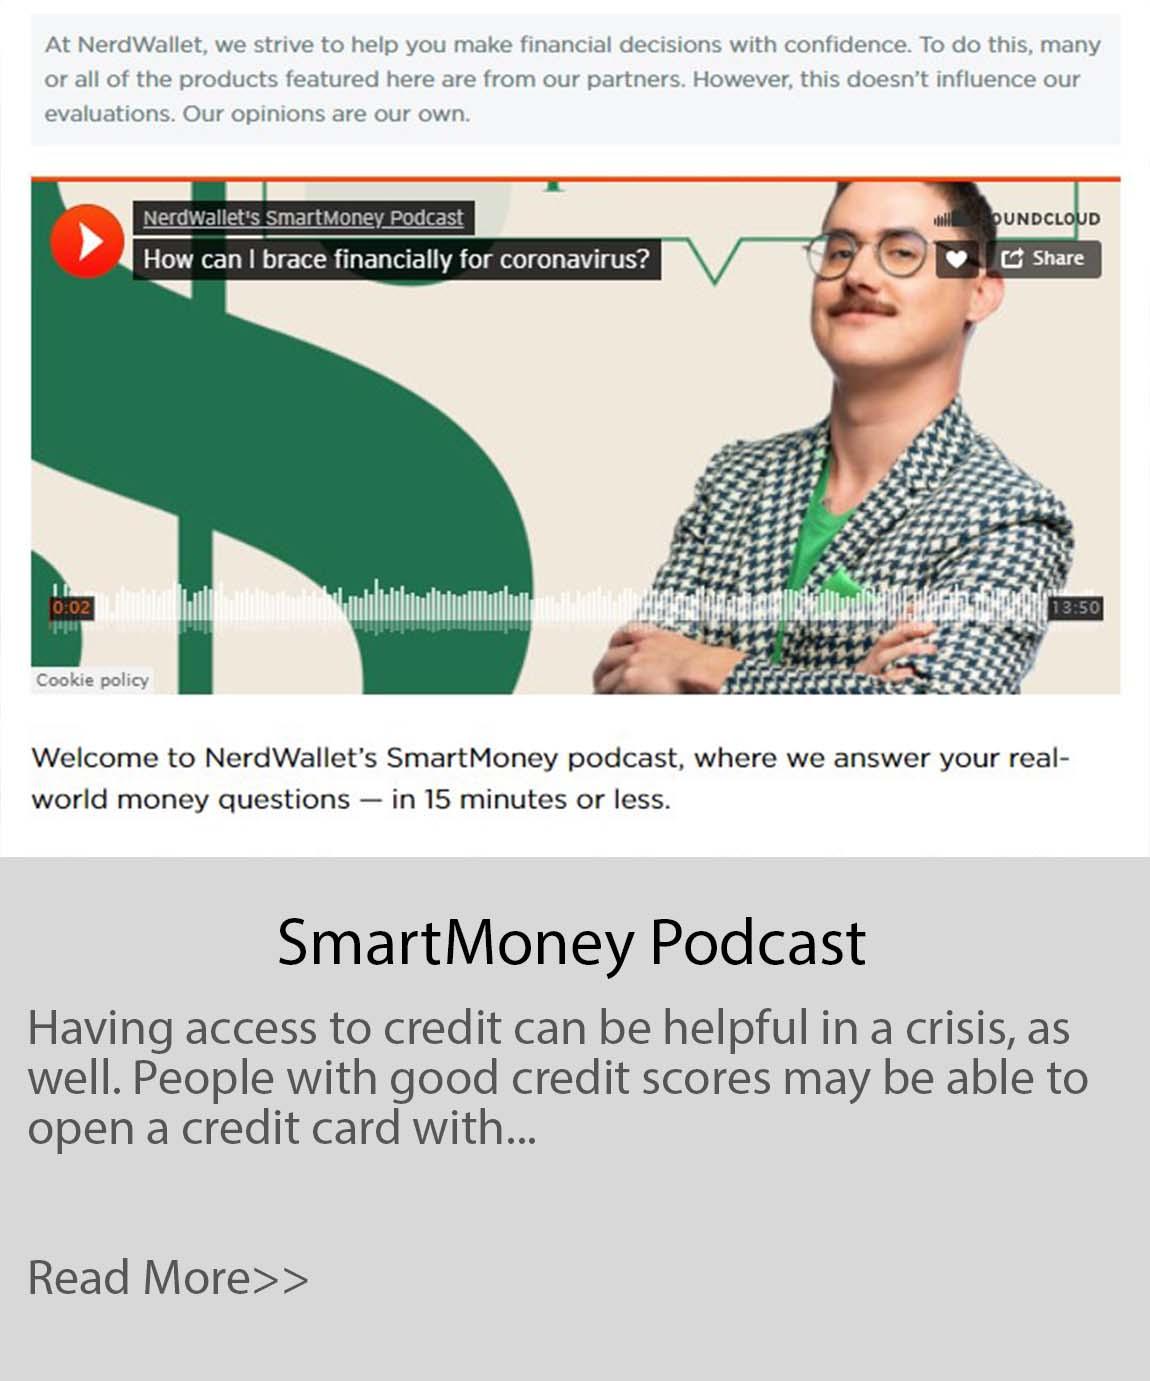 SmartMoney Podcast_Coronaviru edition